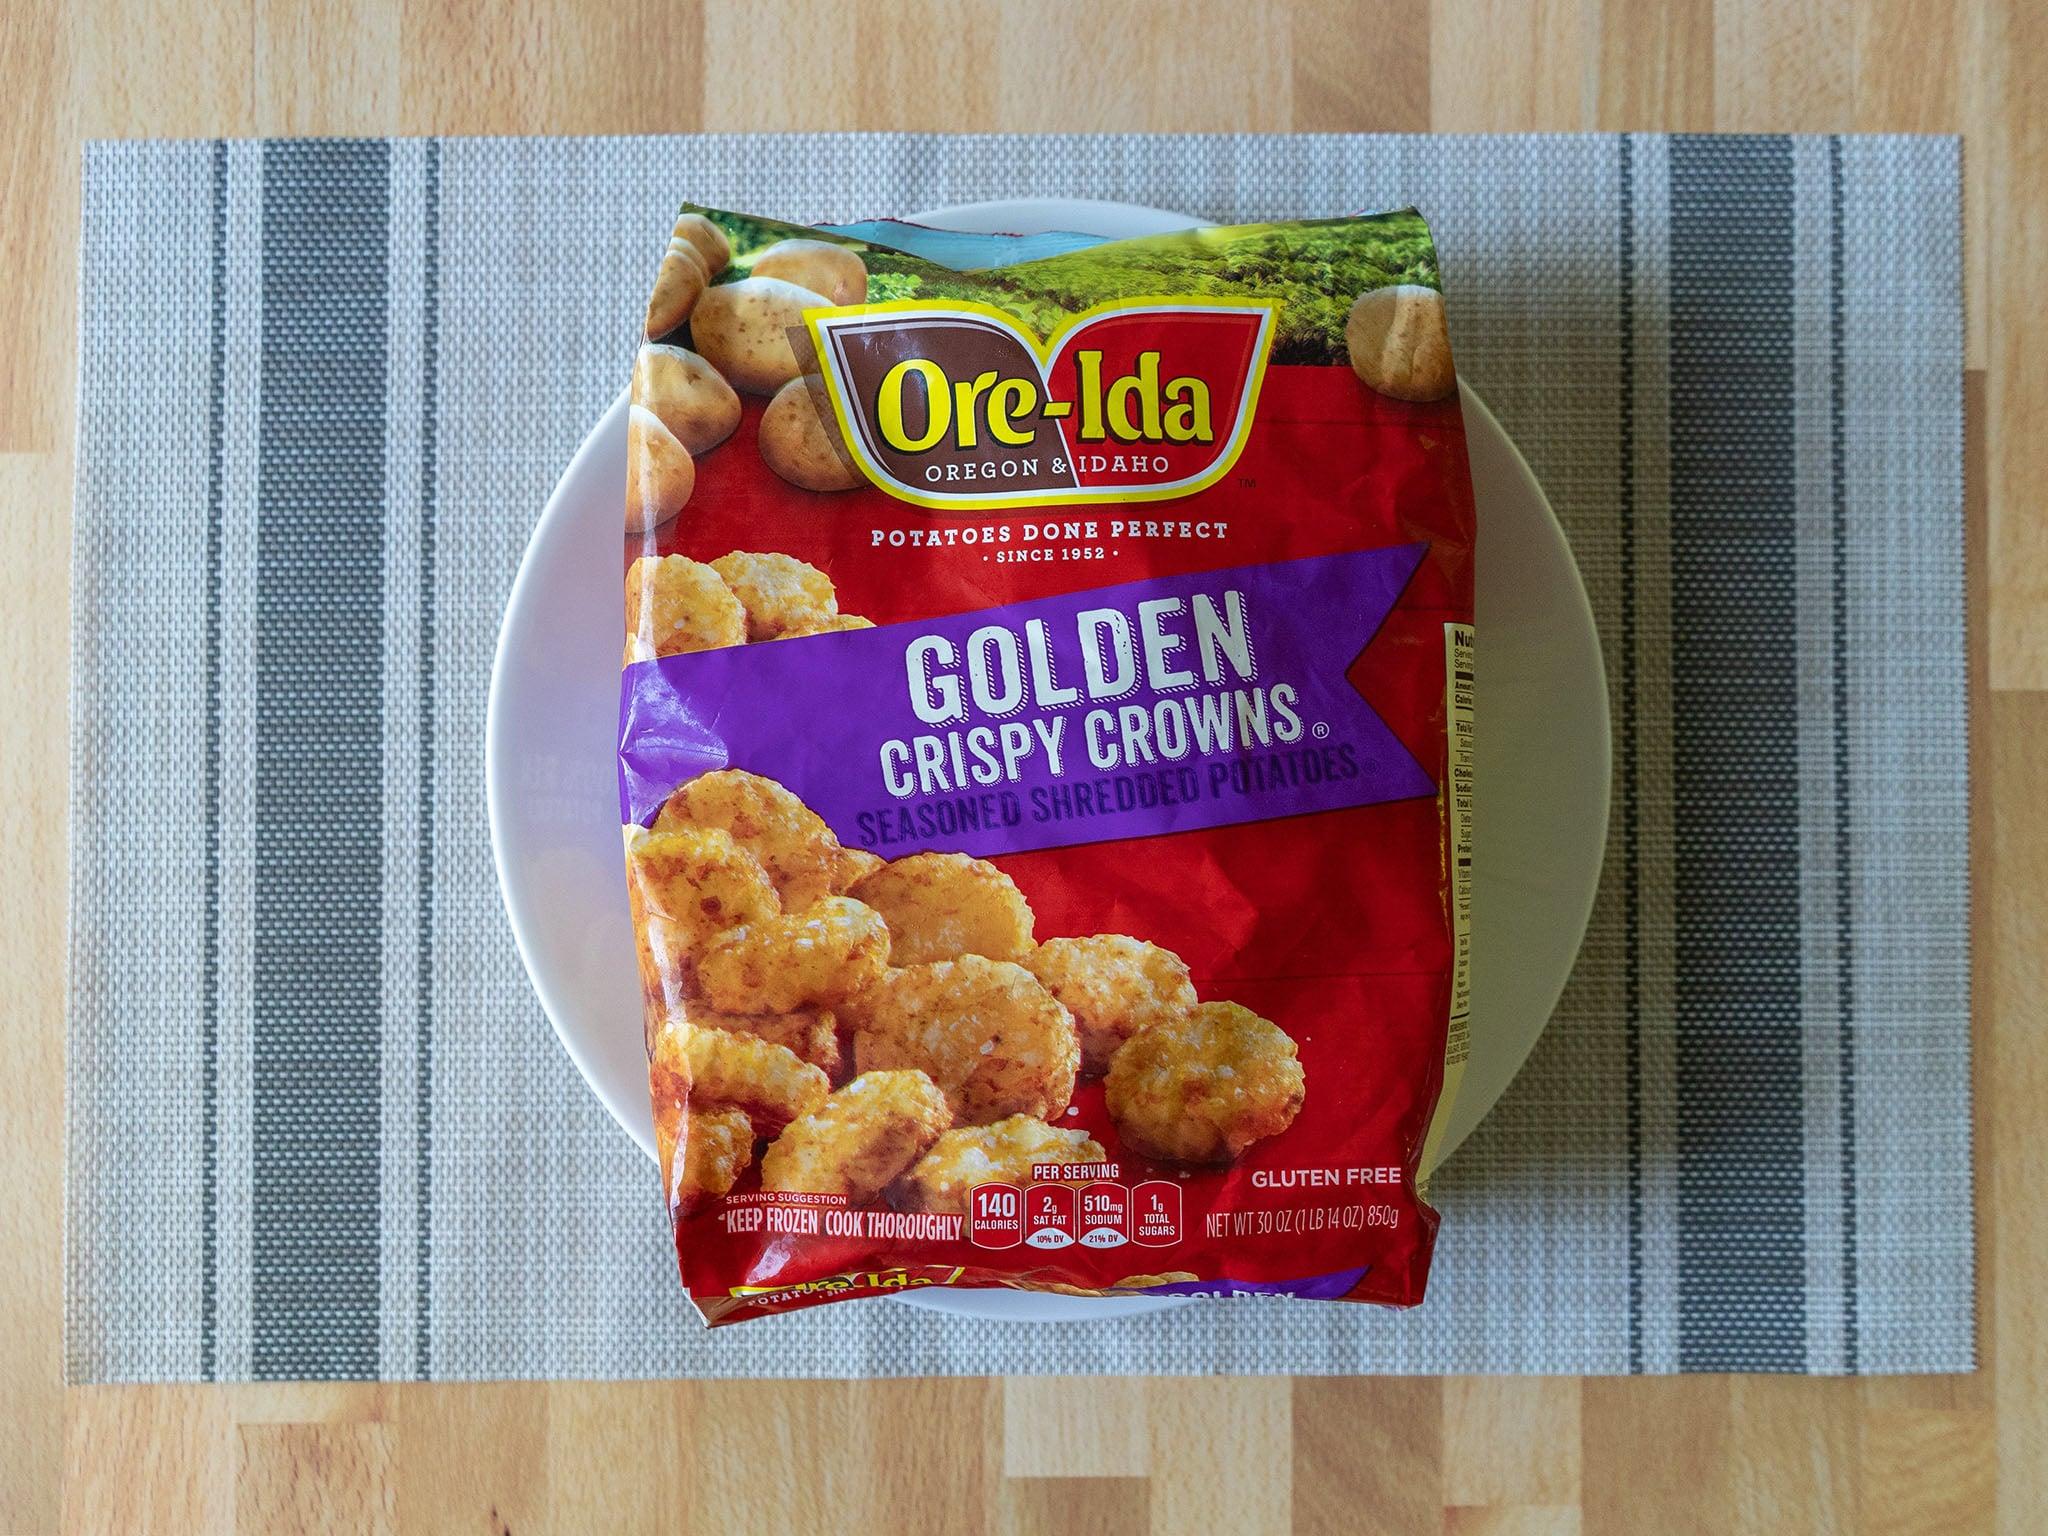 Ore-Ida Golden Crispy Crowns